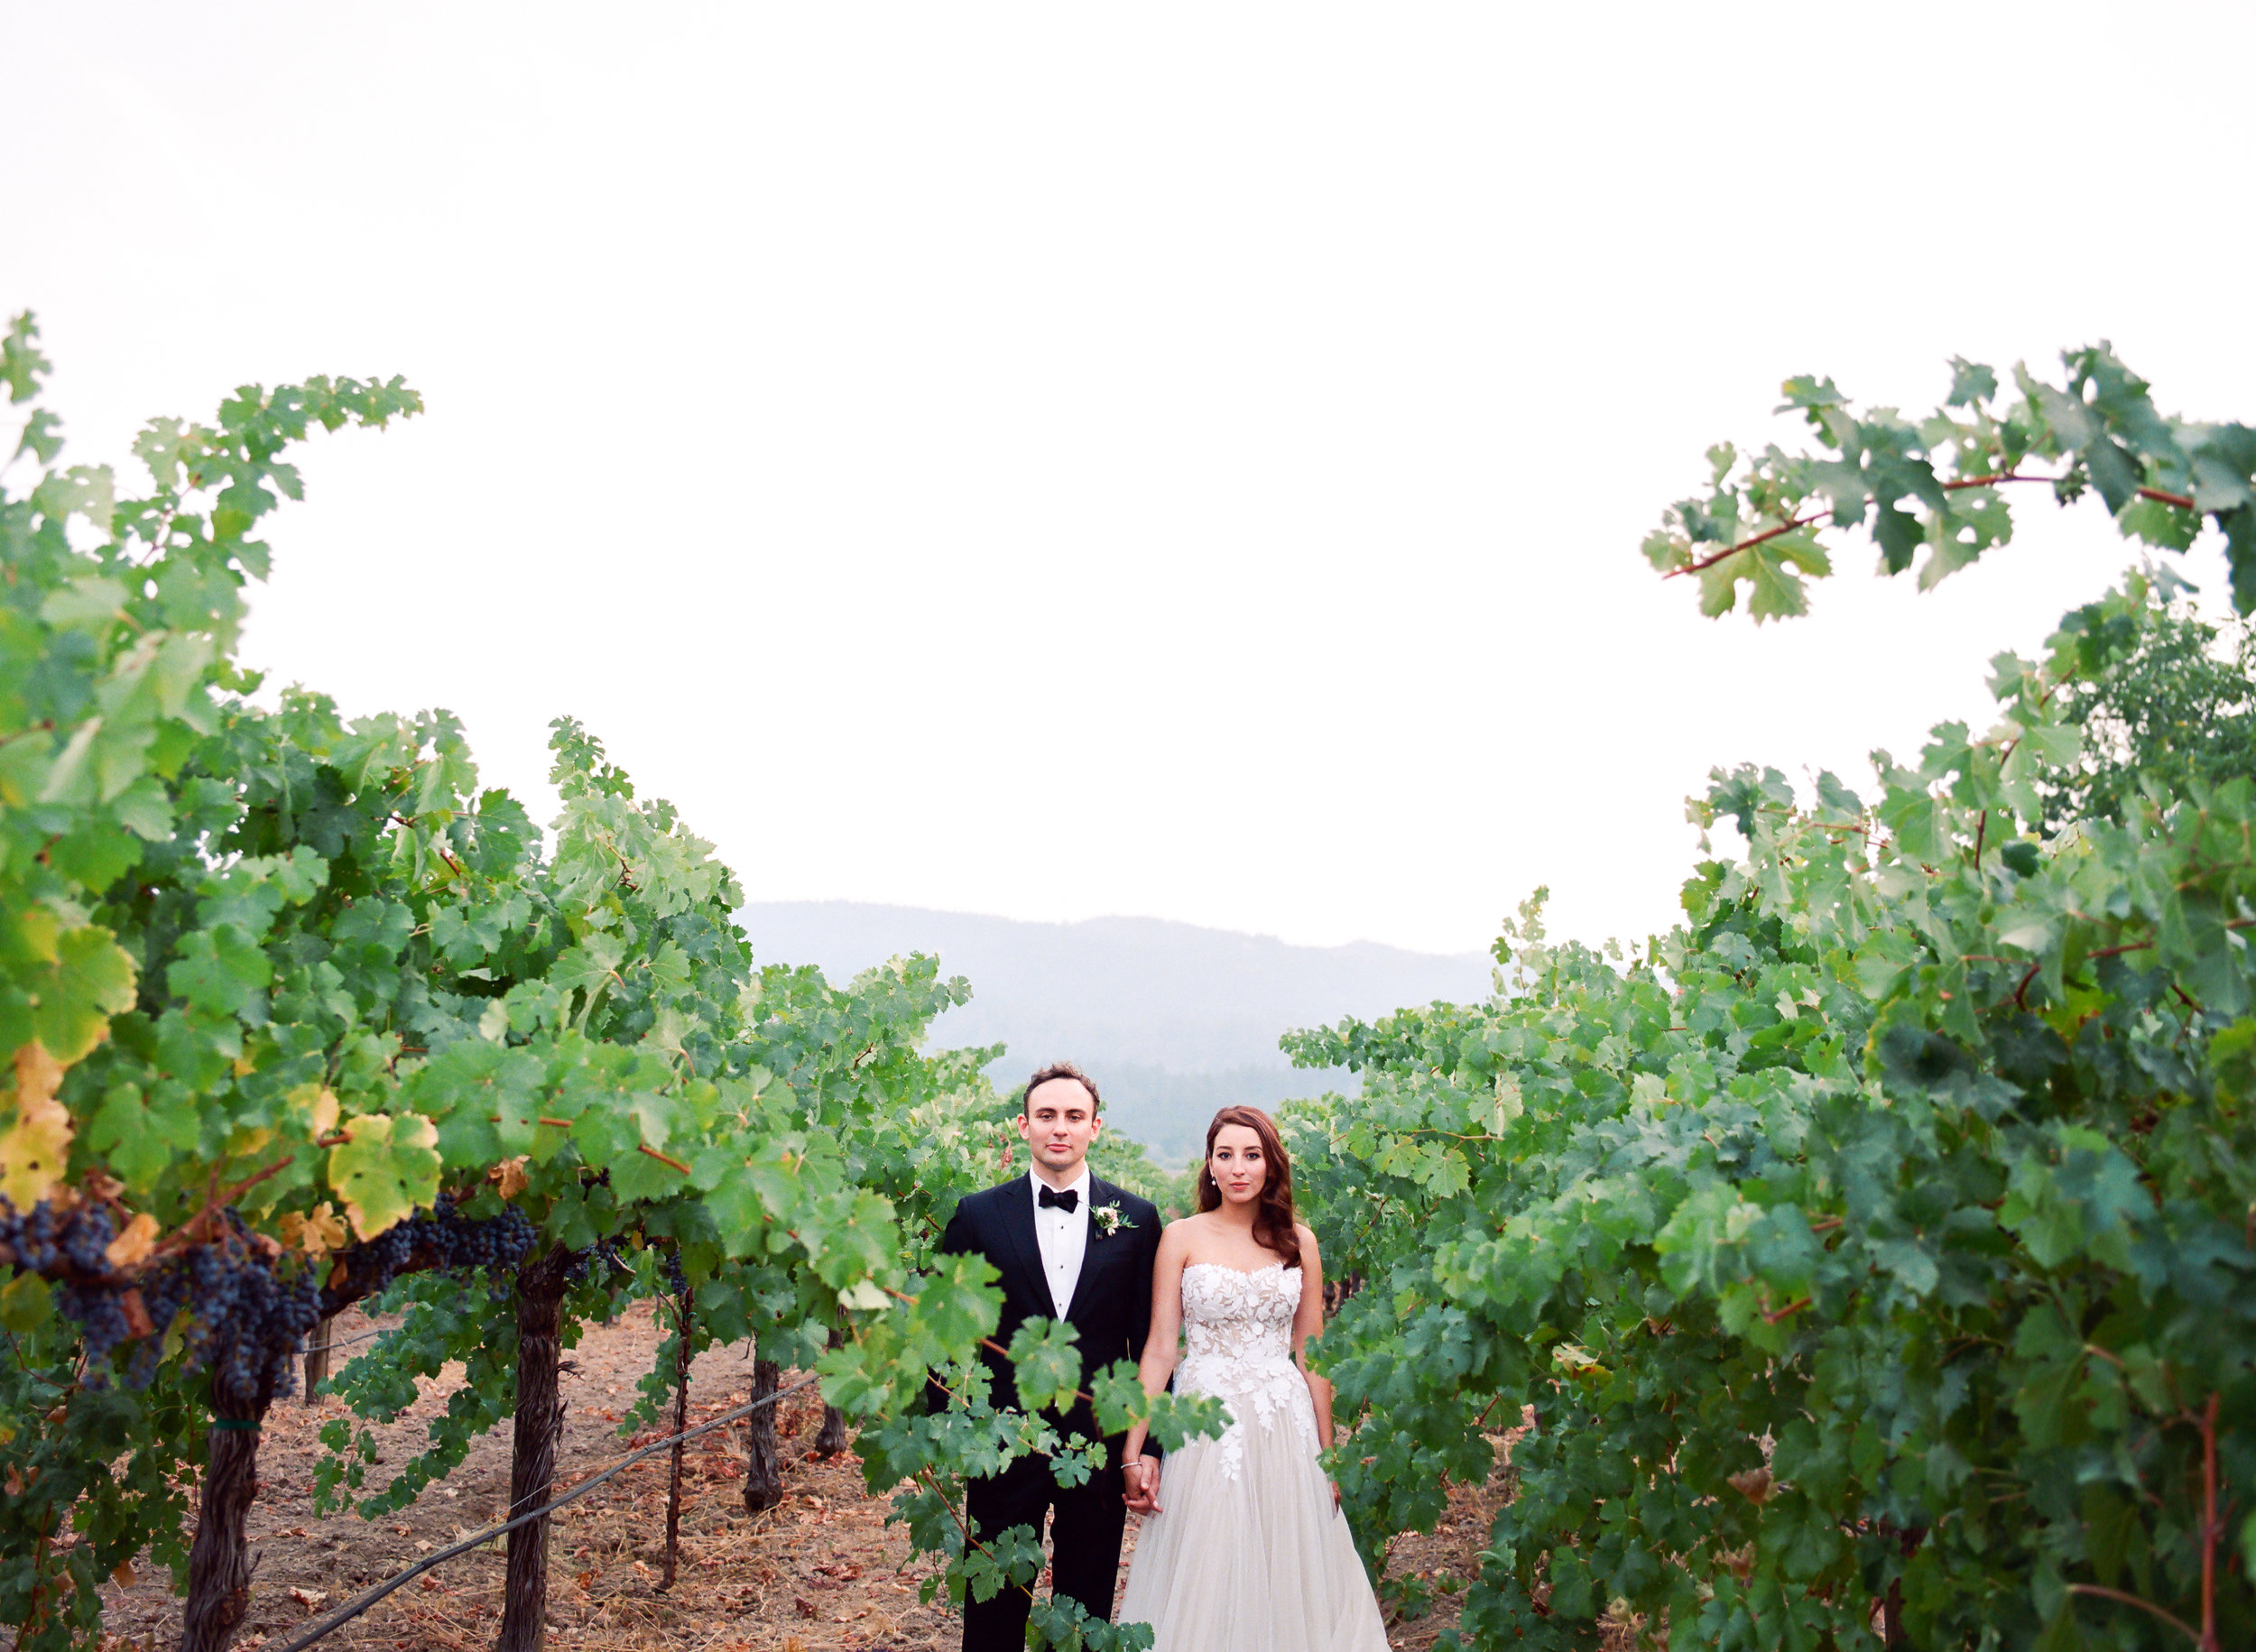 thedejaureguis-Solage-Calistoga-Wedding054.jpg